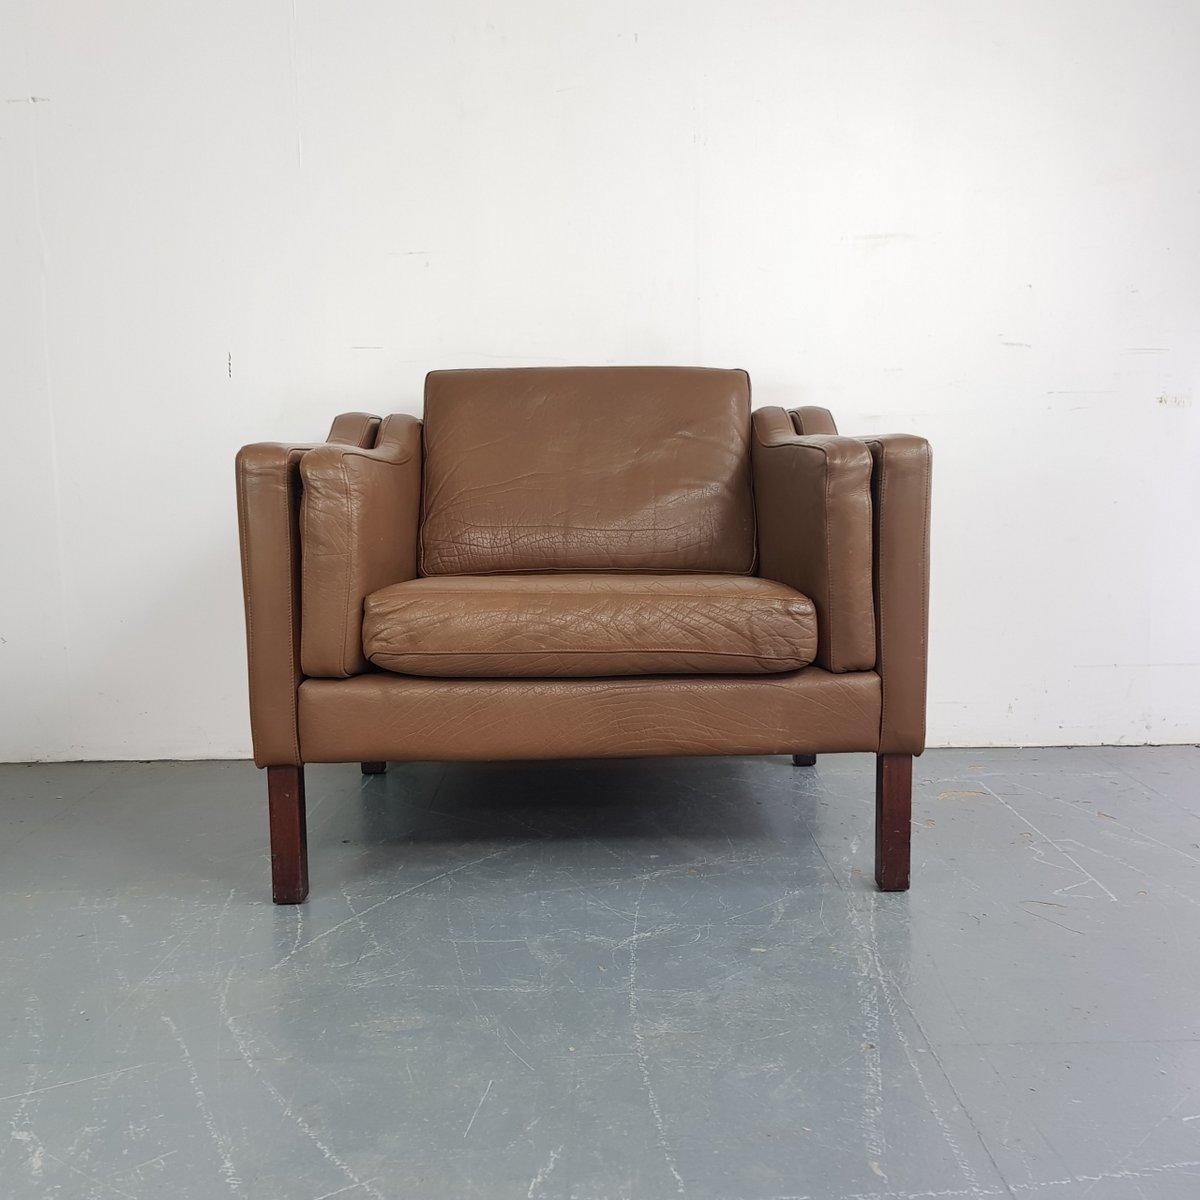 Dänischer brauner Leder Sessel, 1970er